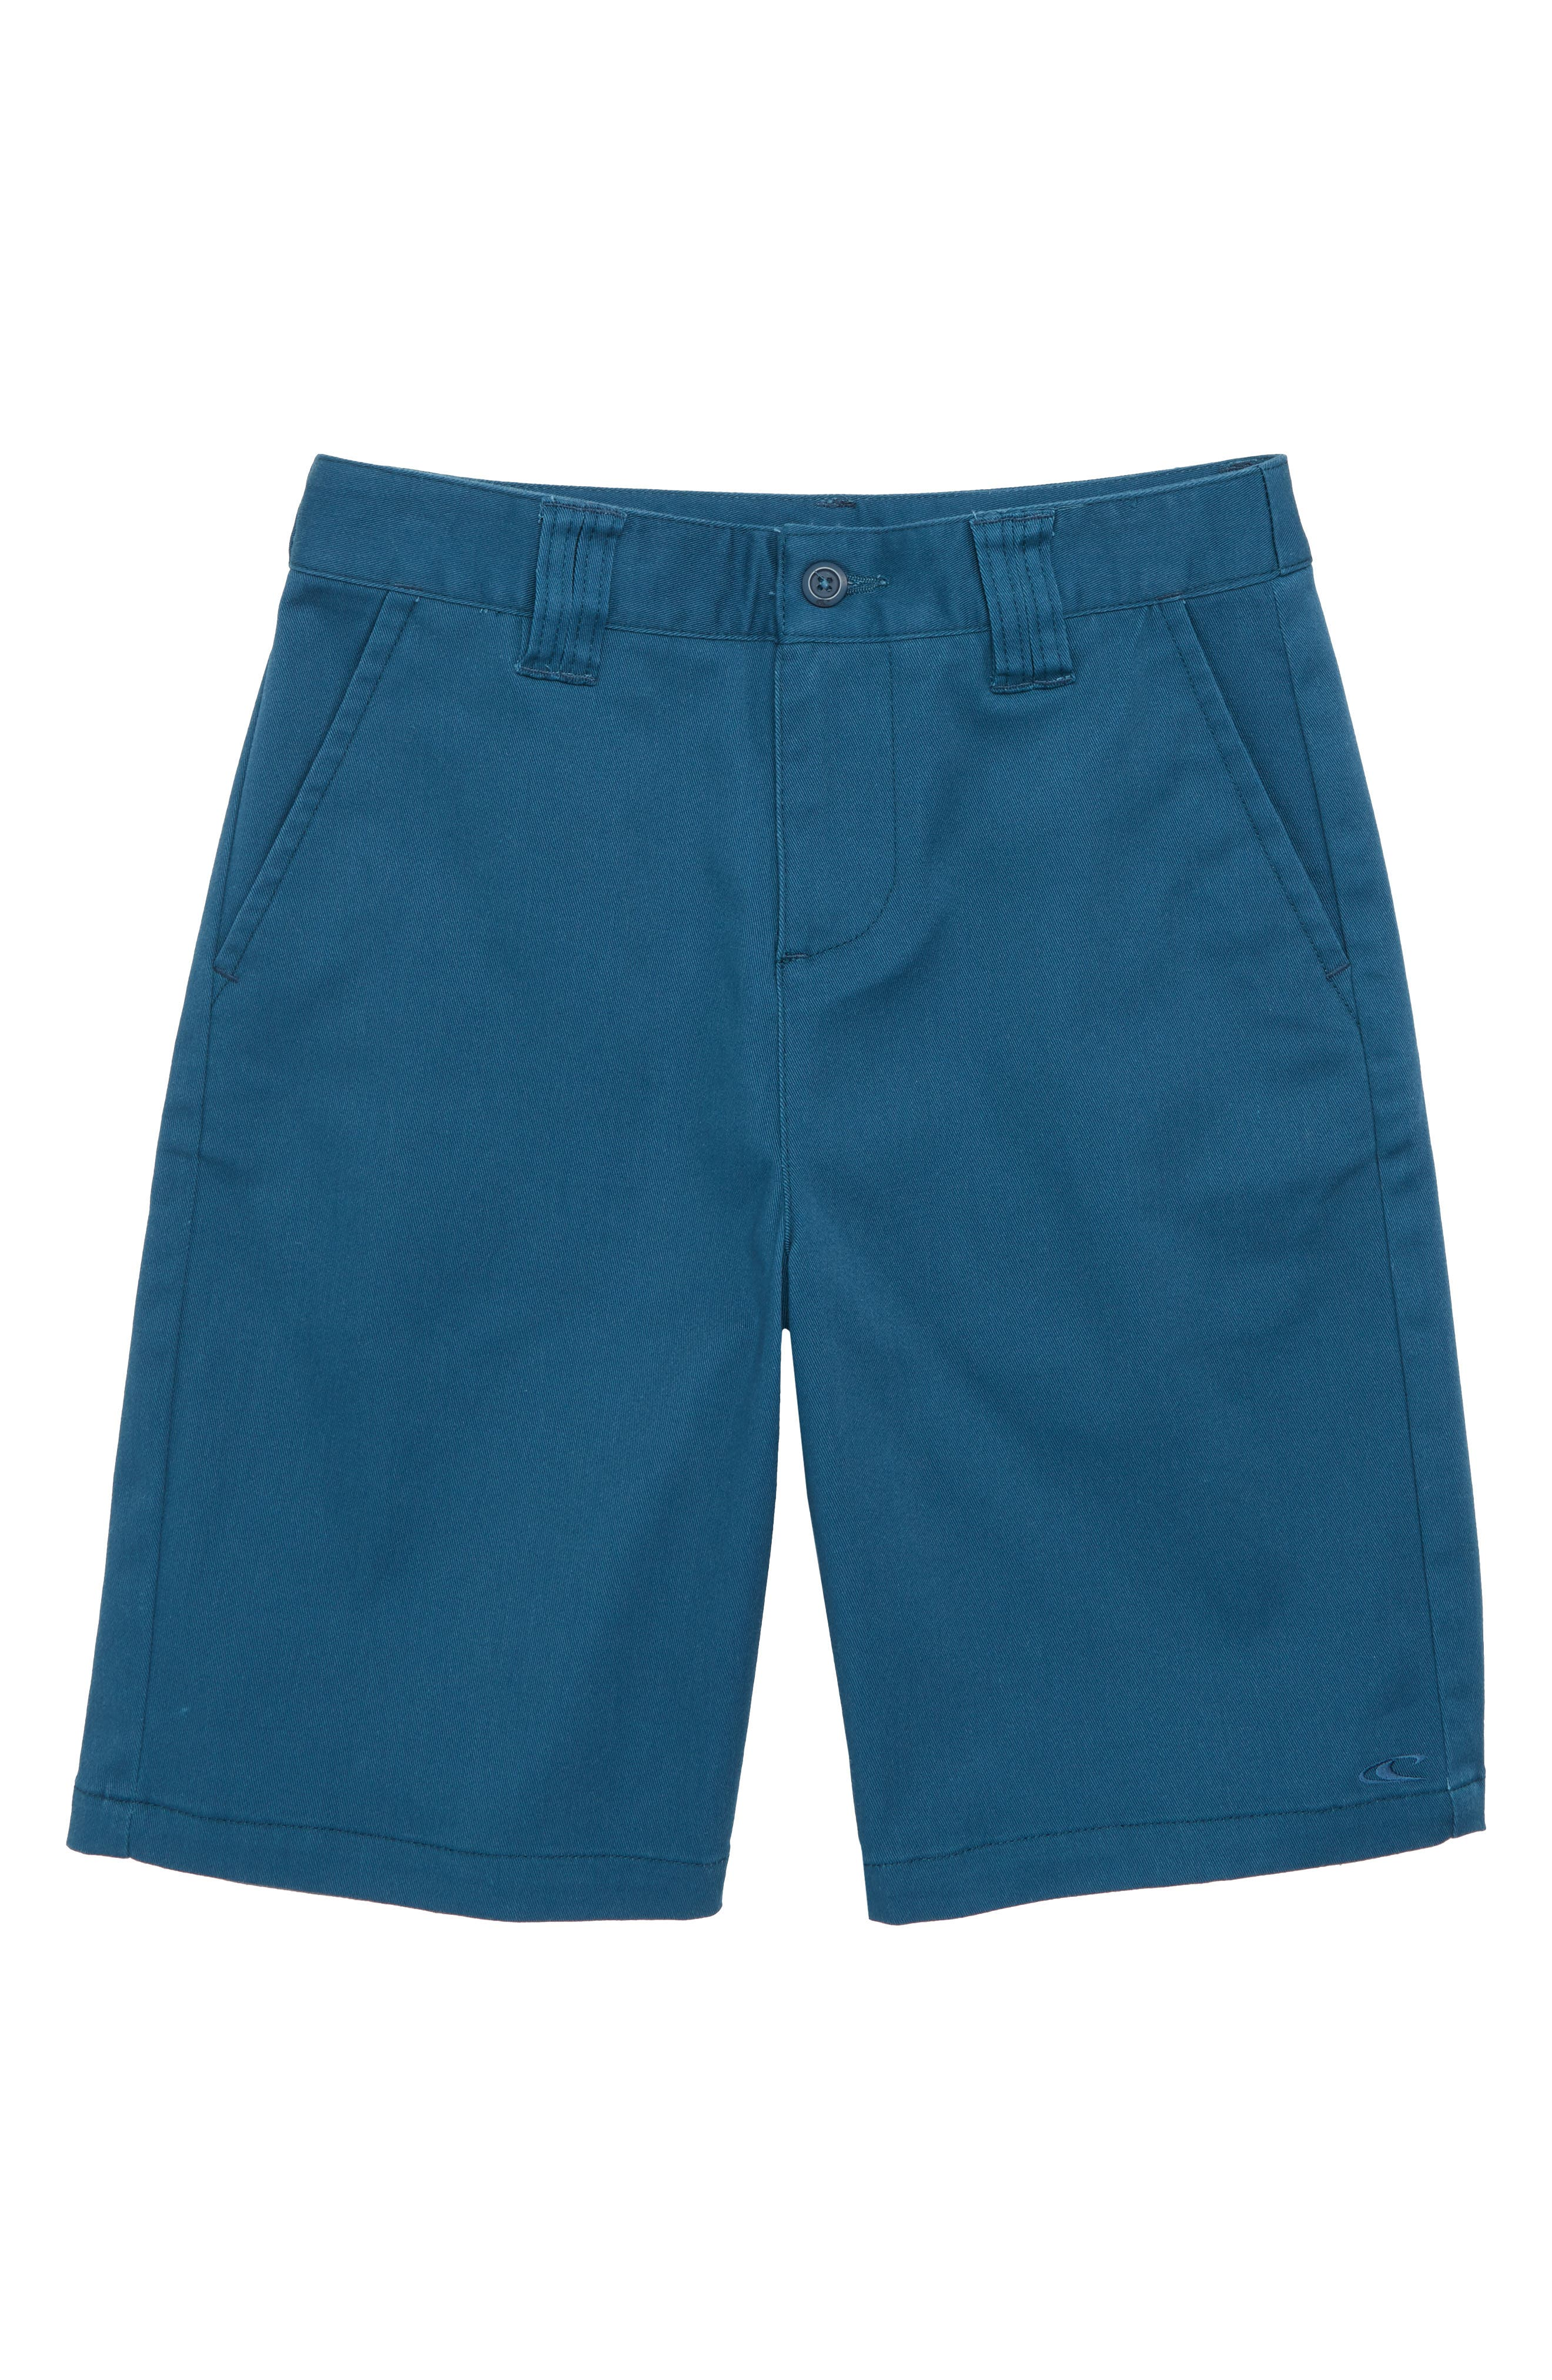 Contact Stretch Shorts,                             Main thumbnail 1, color,                             Dark Blue